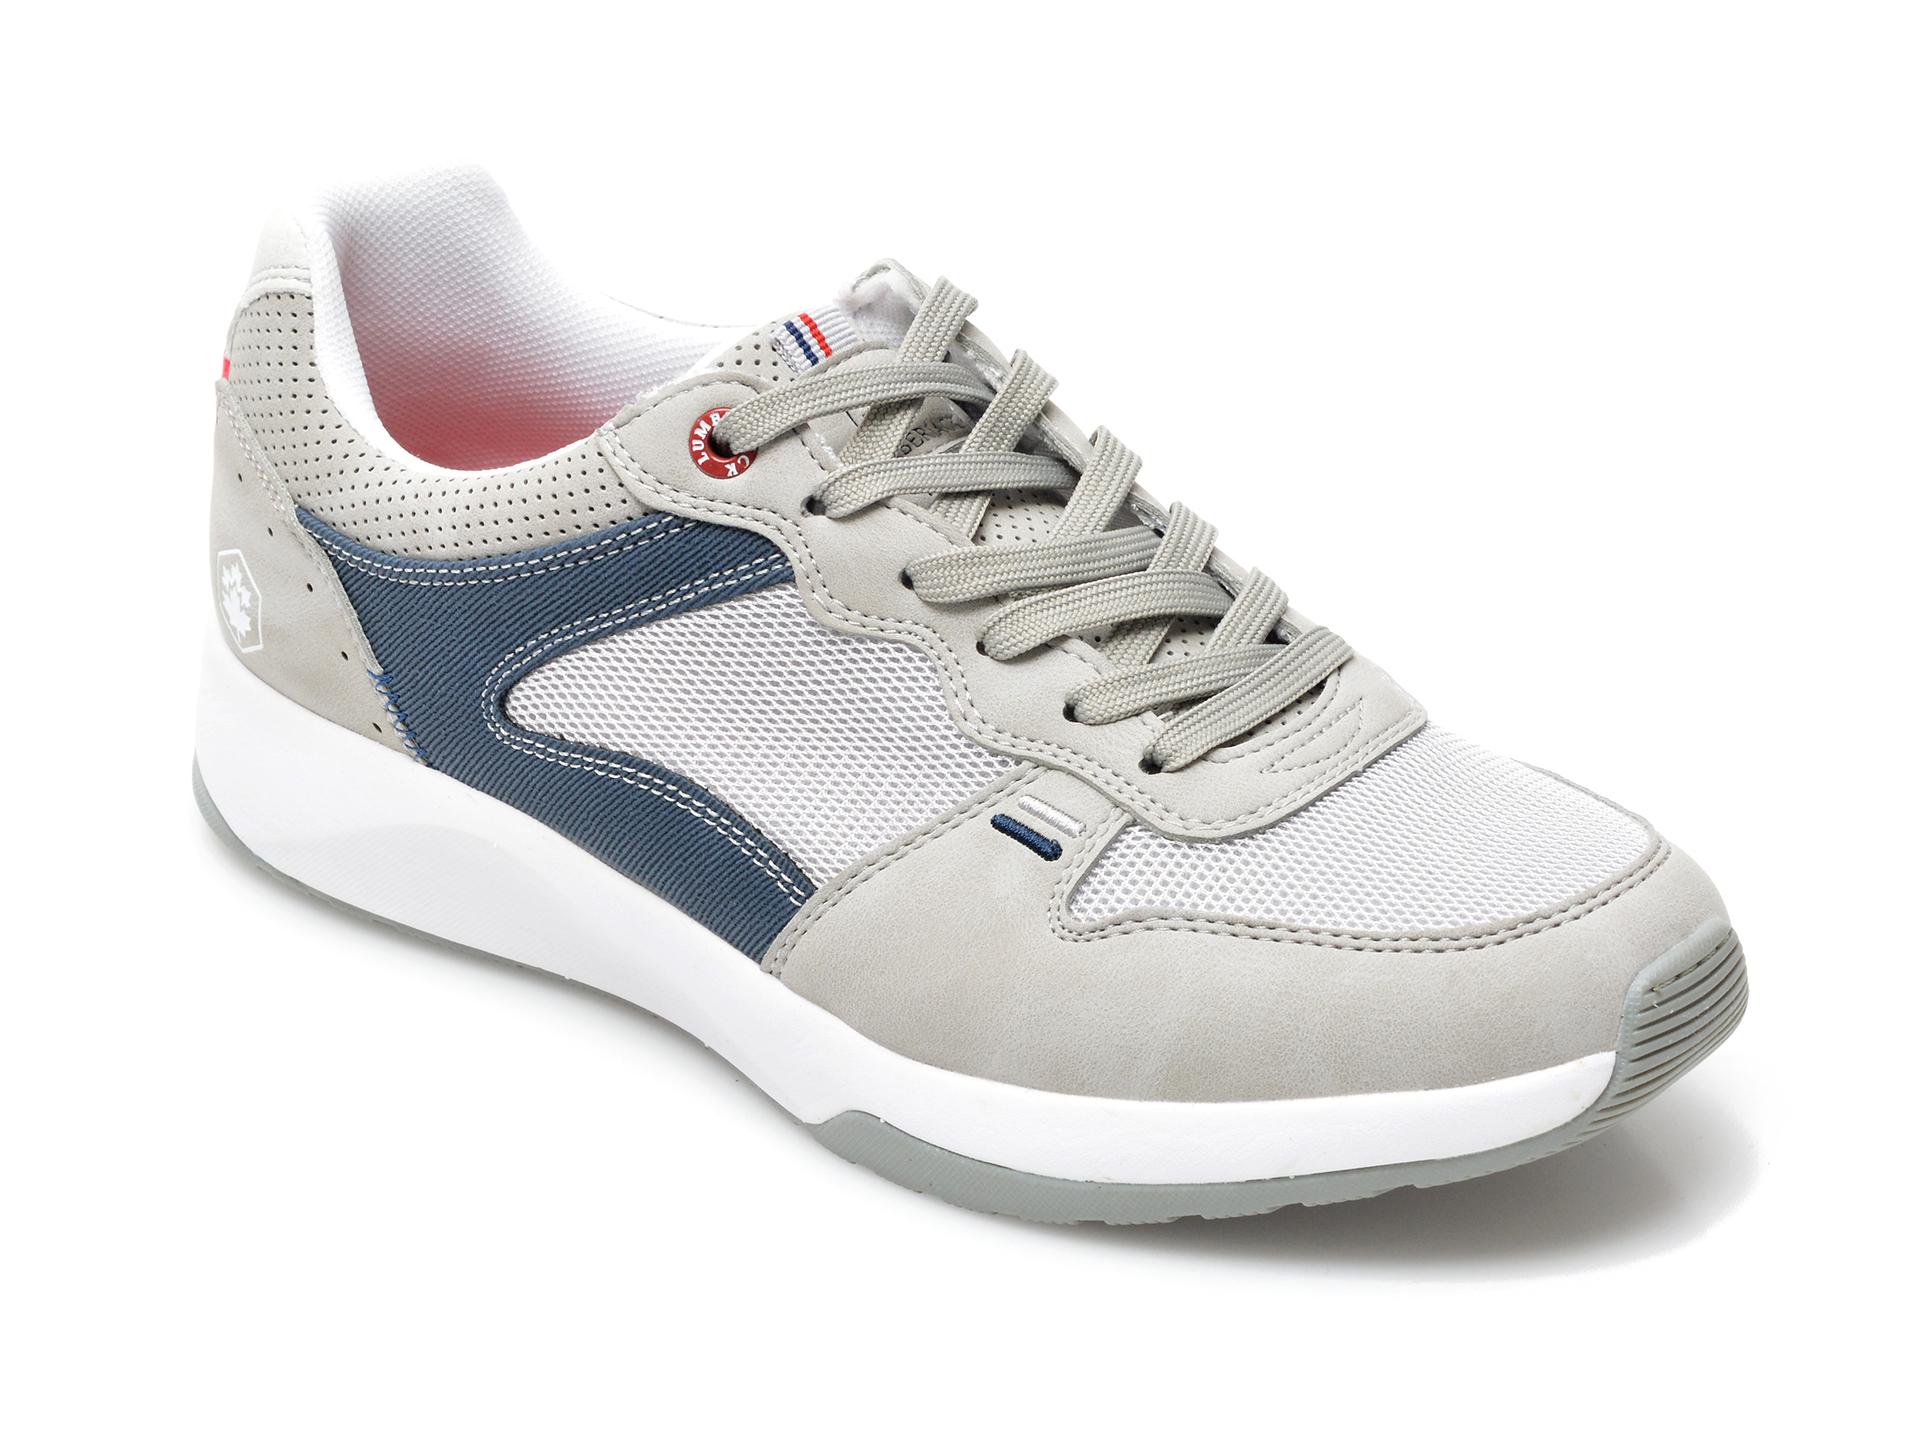 Pantofi Sport Lumberjack Gri, 8651005, Din Material Textil Si Piele Ecologica